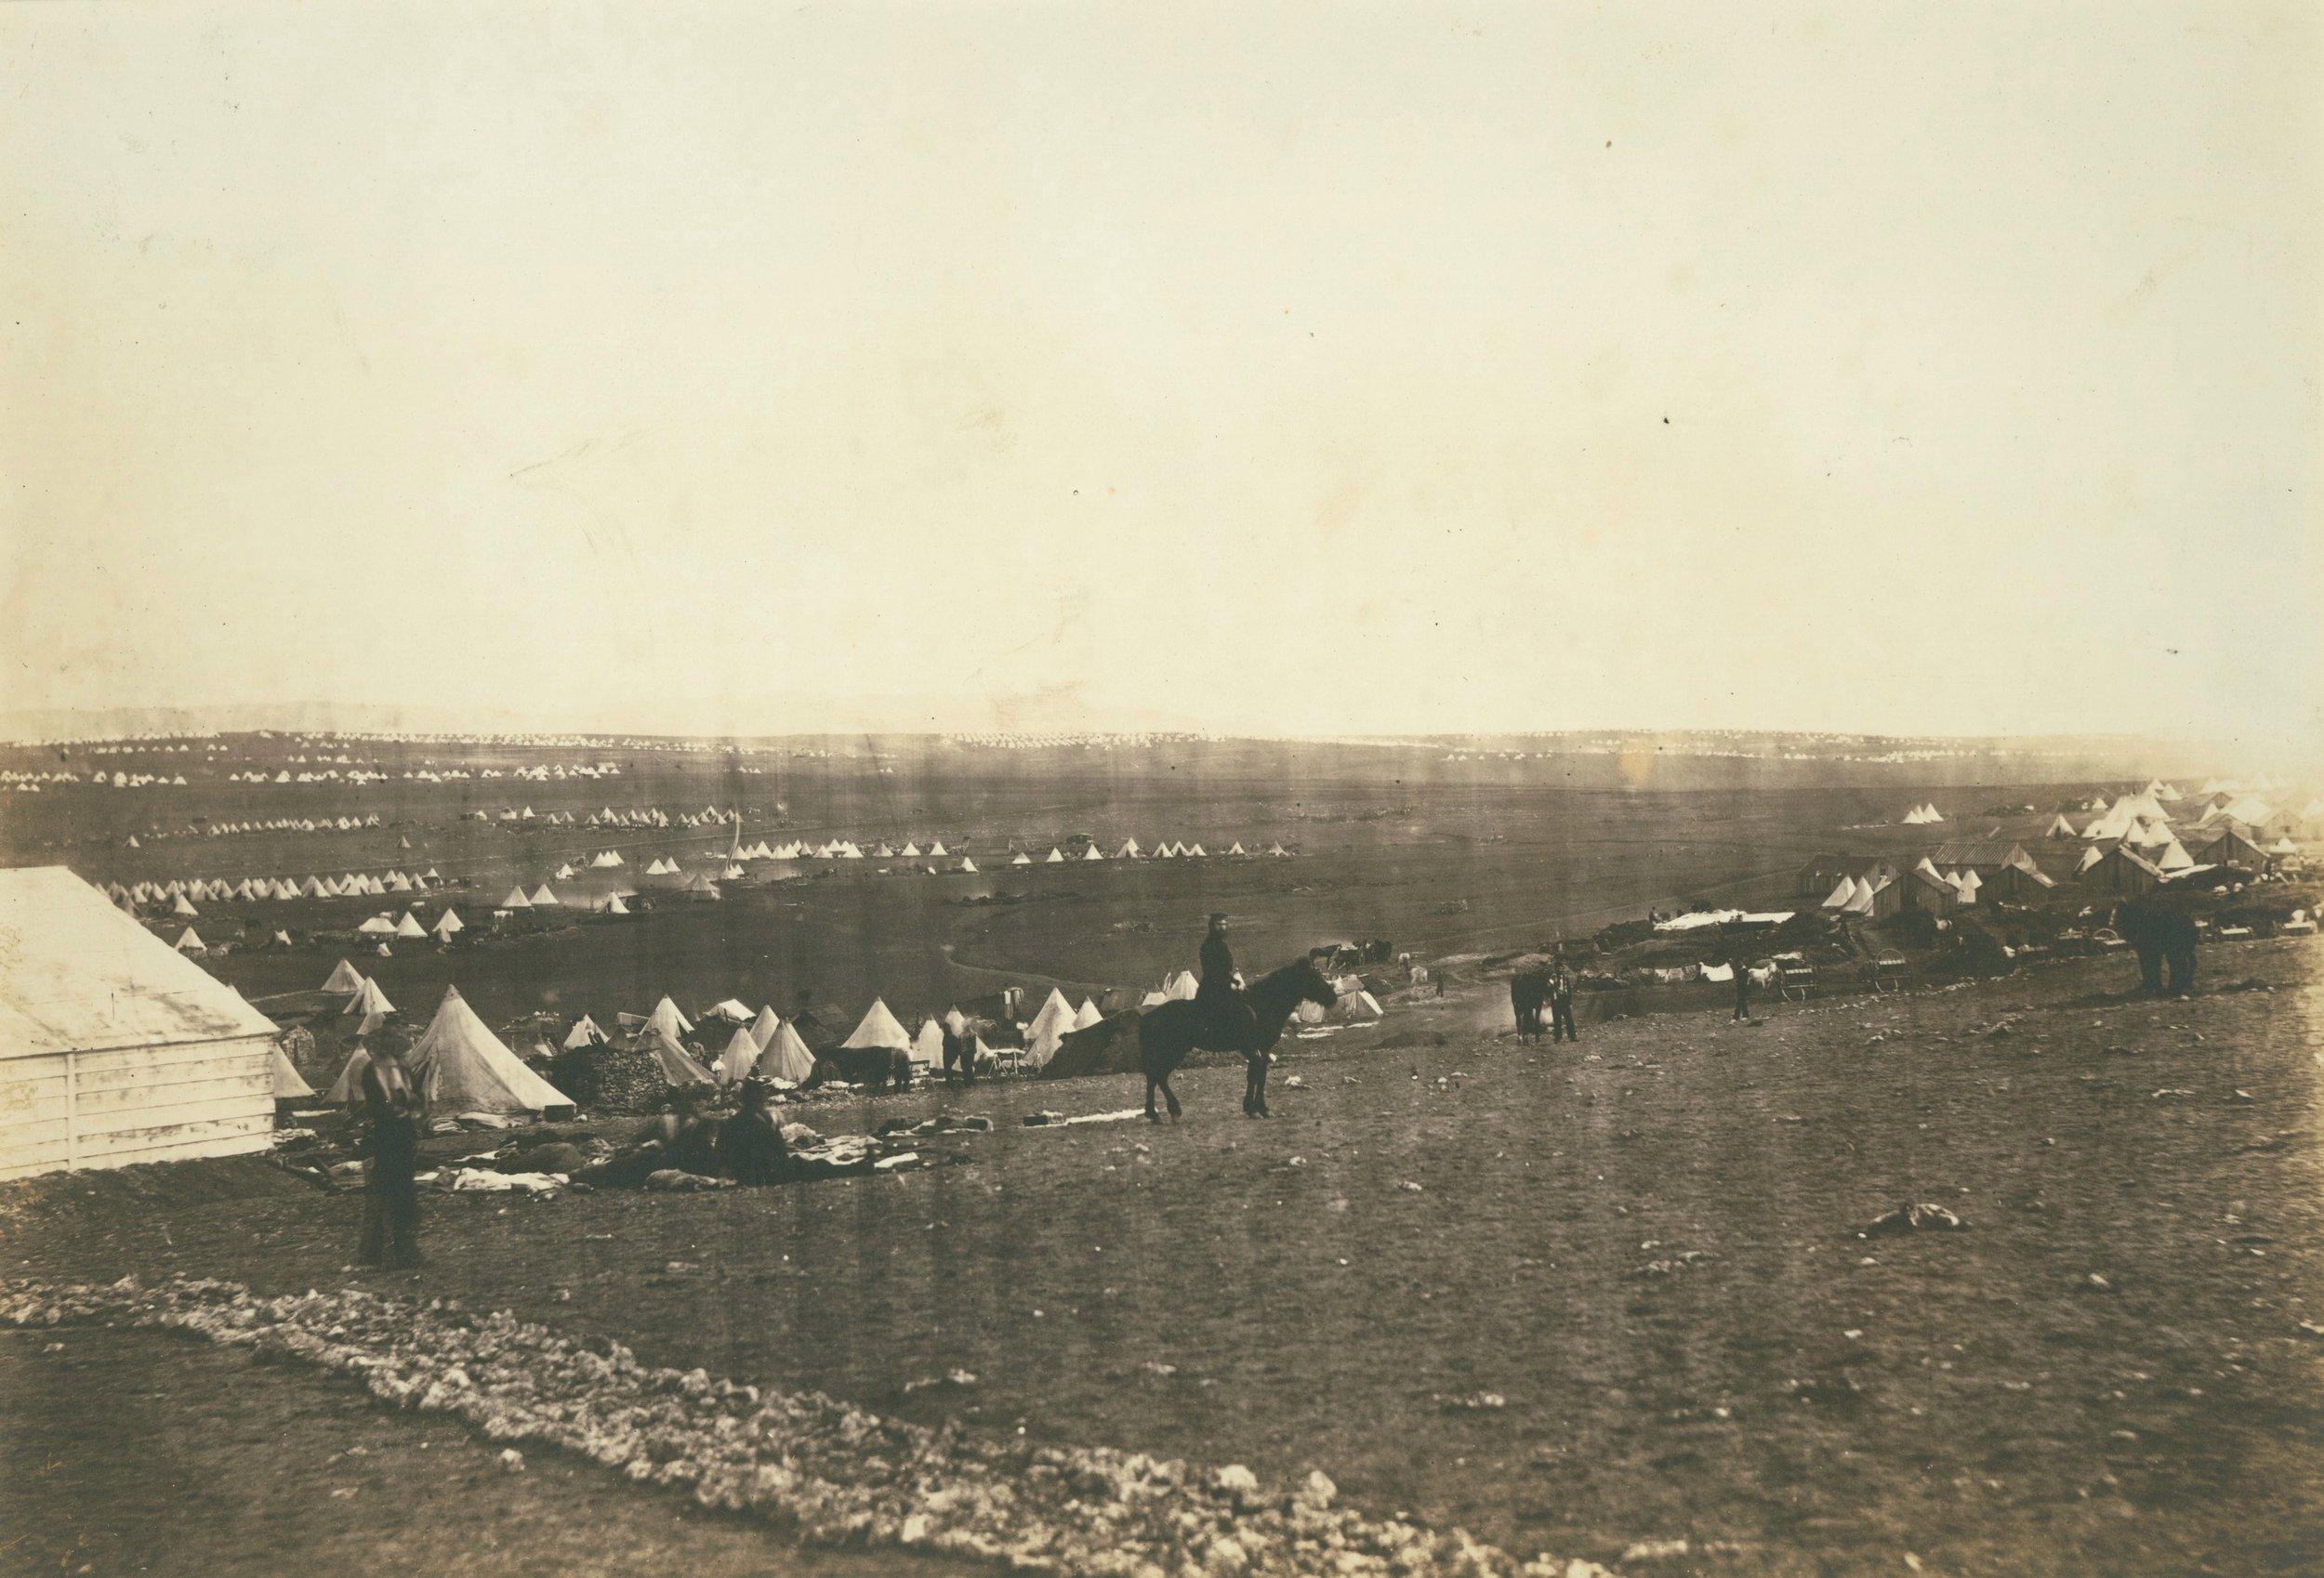 ROGER FENTON,  Crimean War: Plateau Before Sabastapol, Turkish Tents in the Distance,  1855